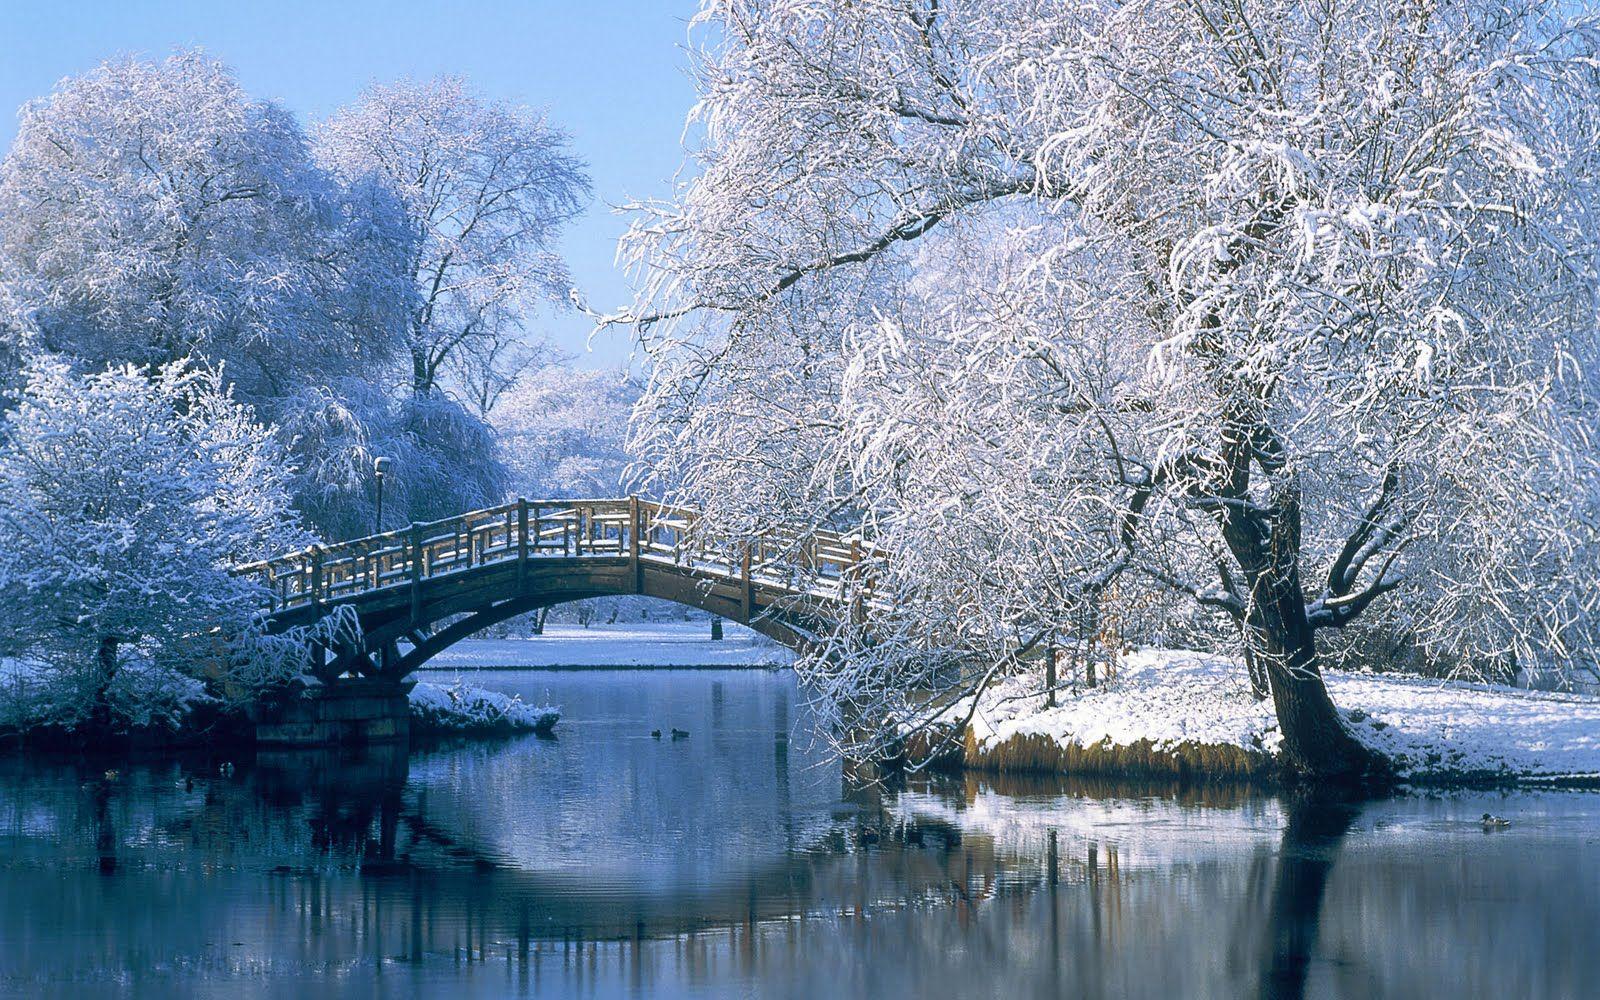 Winter Wonderland Desktop Background Winter scenery